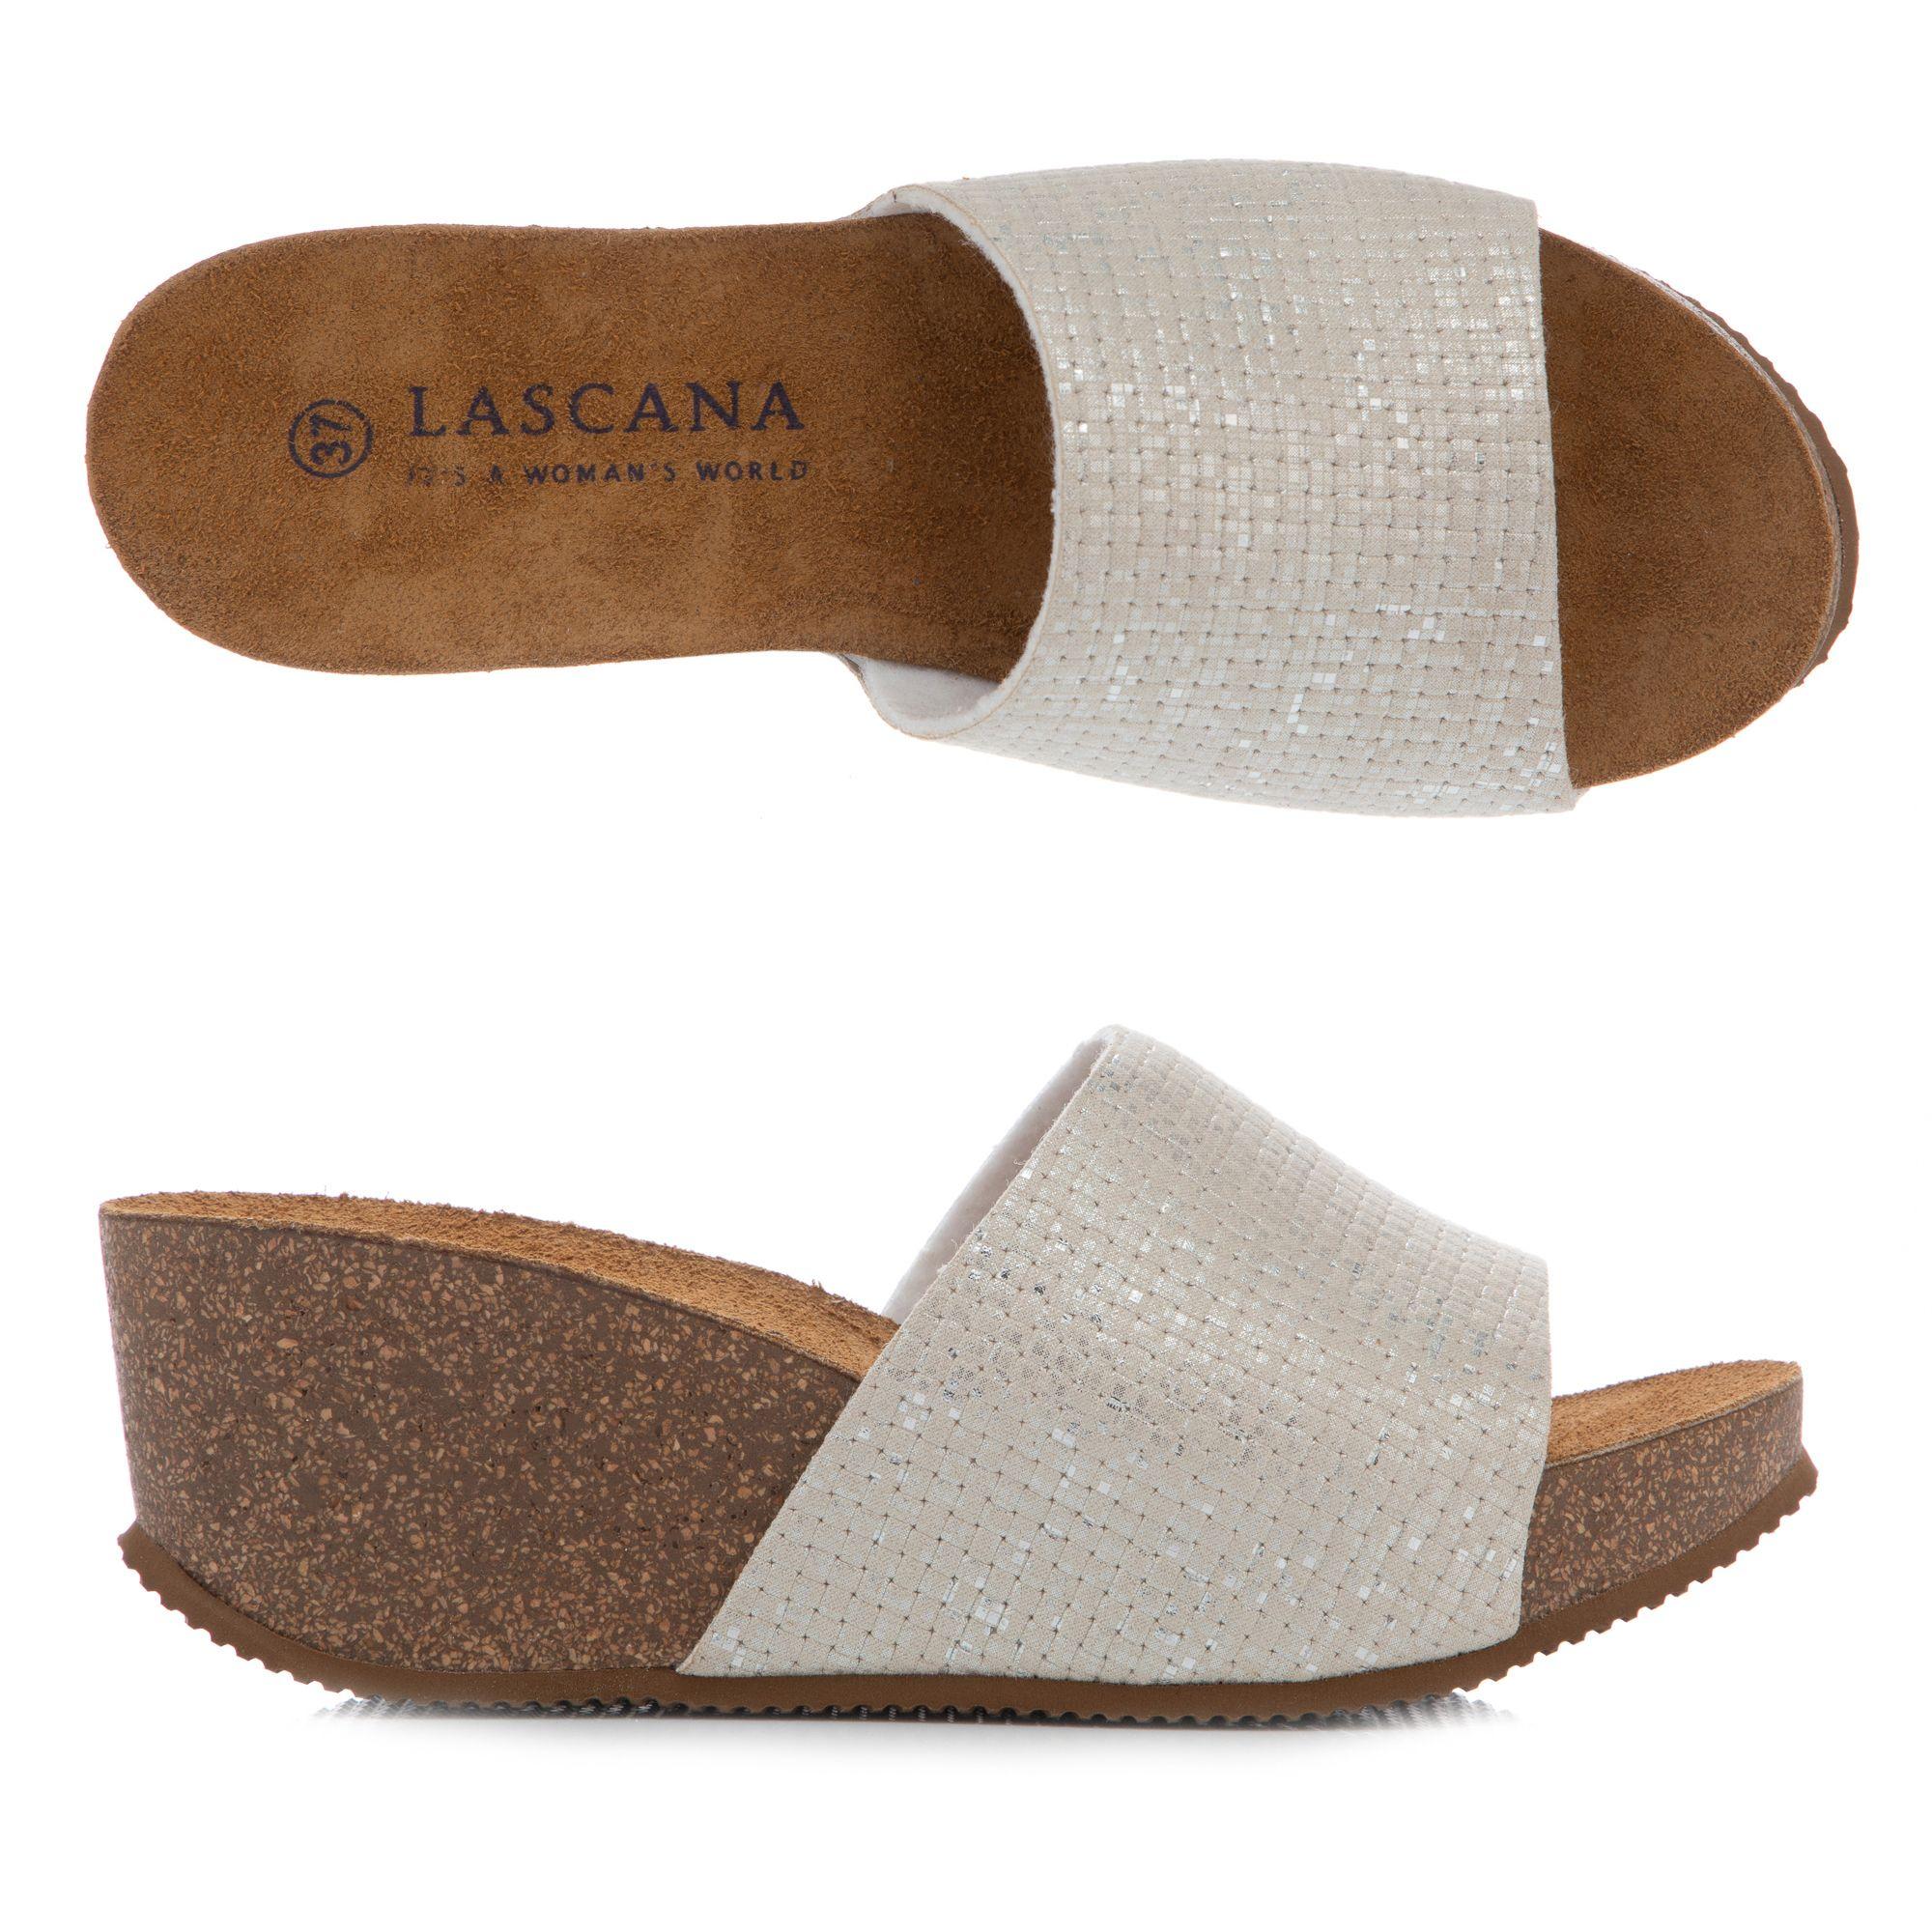 LASCANA Pantolette für Damen bei